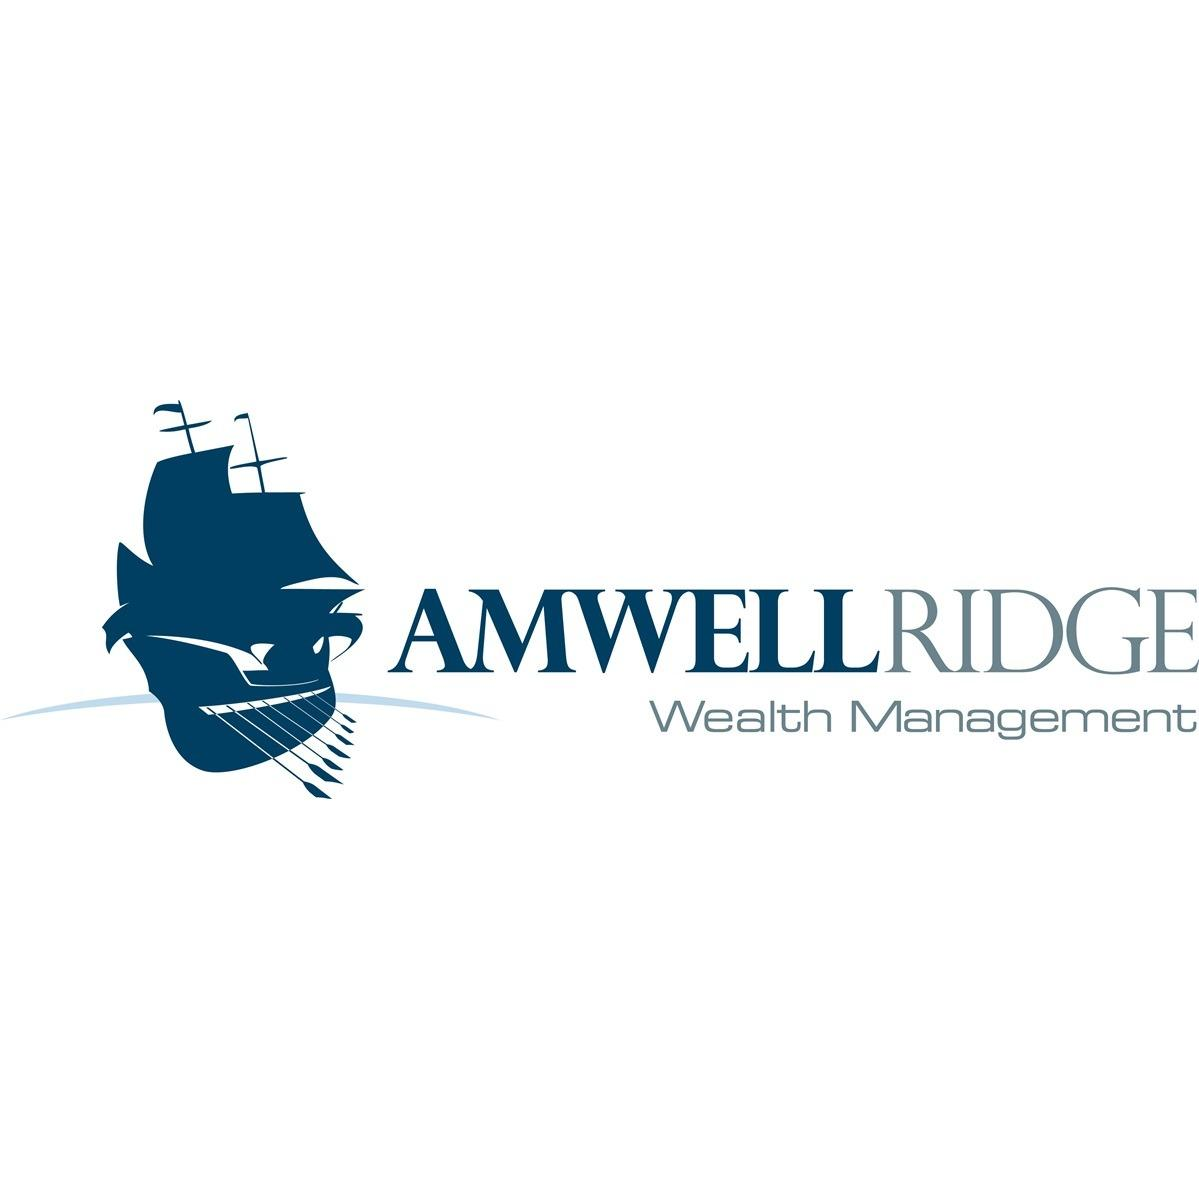 Amwell Ridge Wealth Management image 5